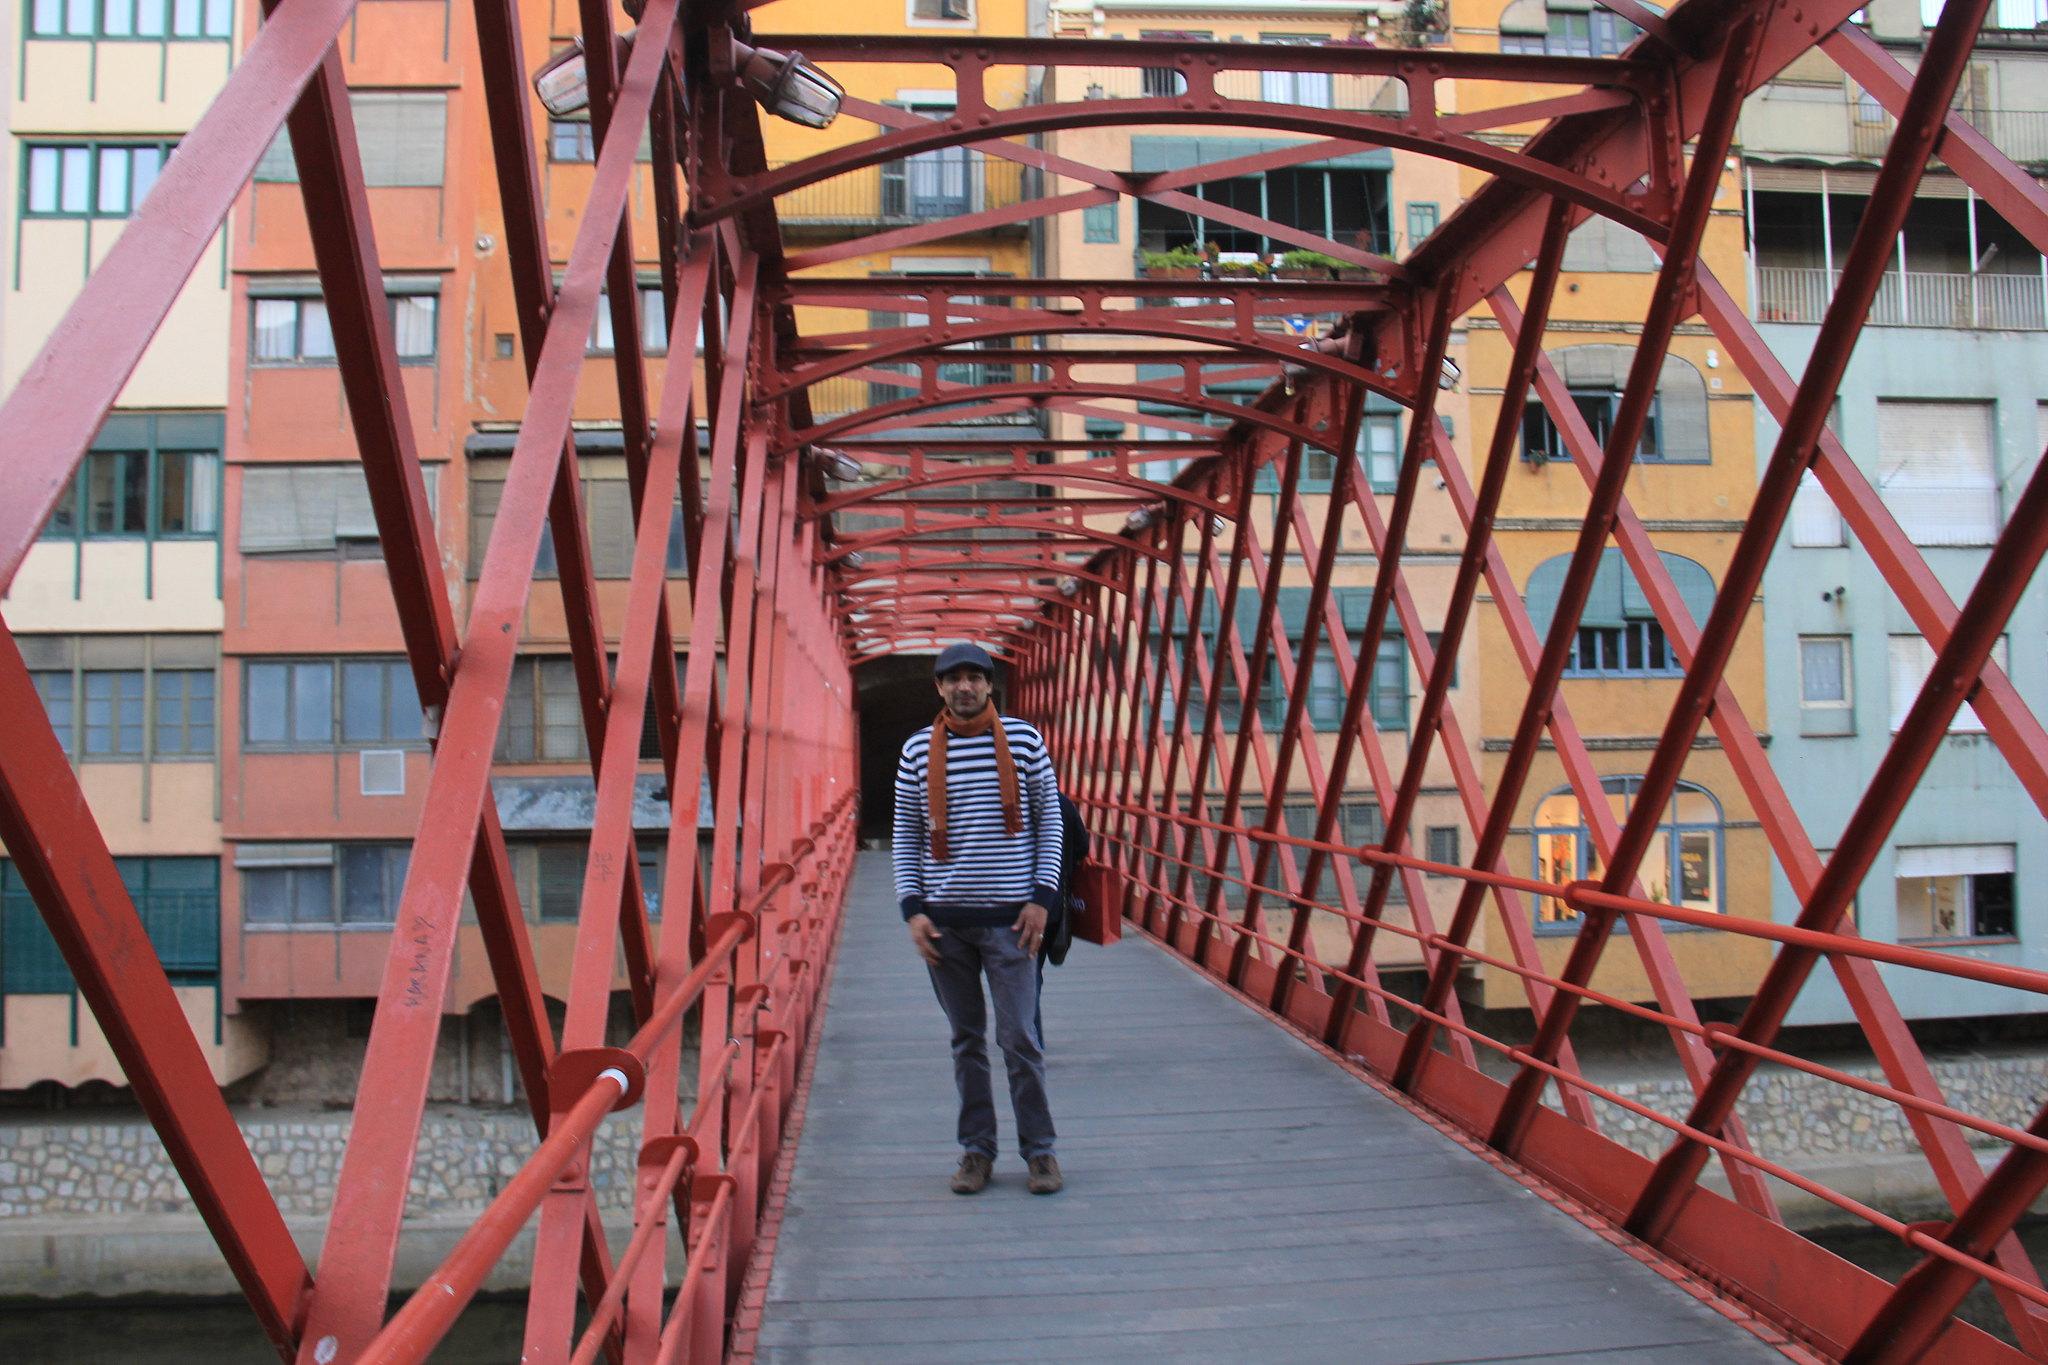 Eiffel Bridge on River Onyar in Girona